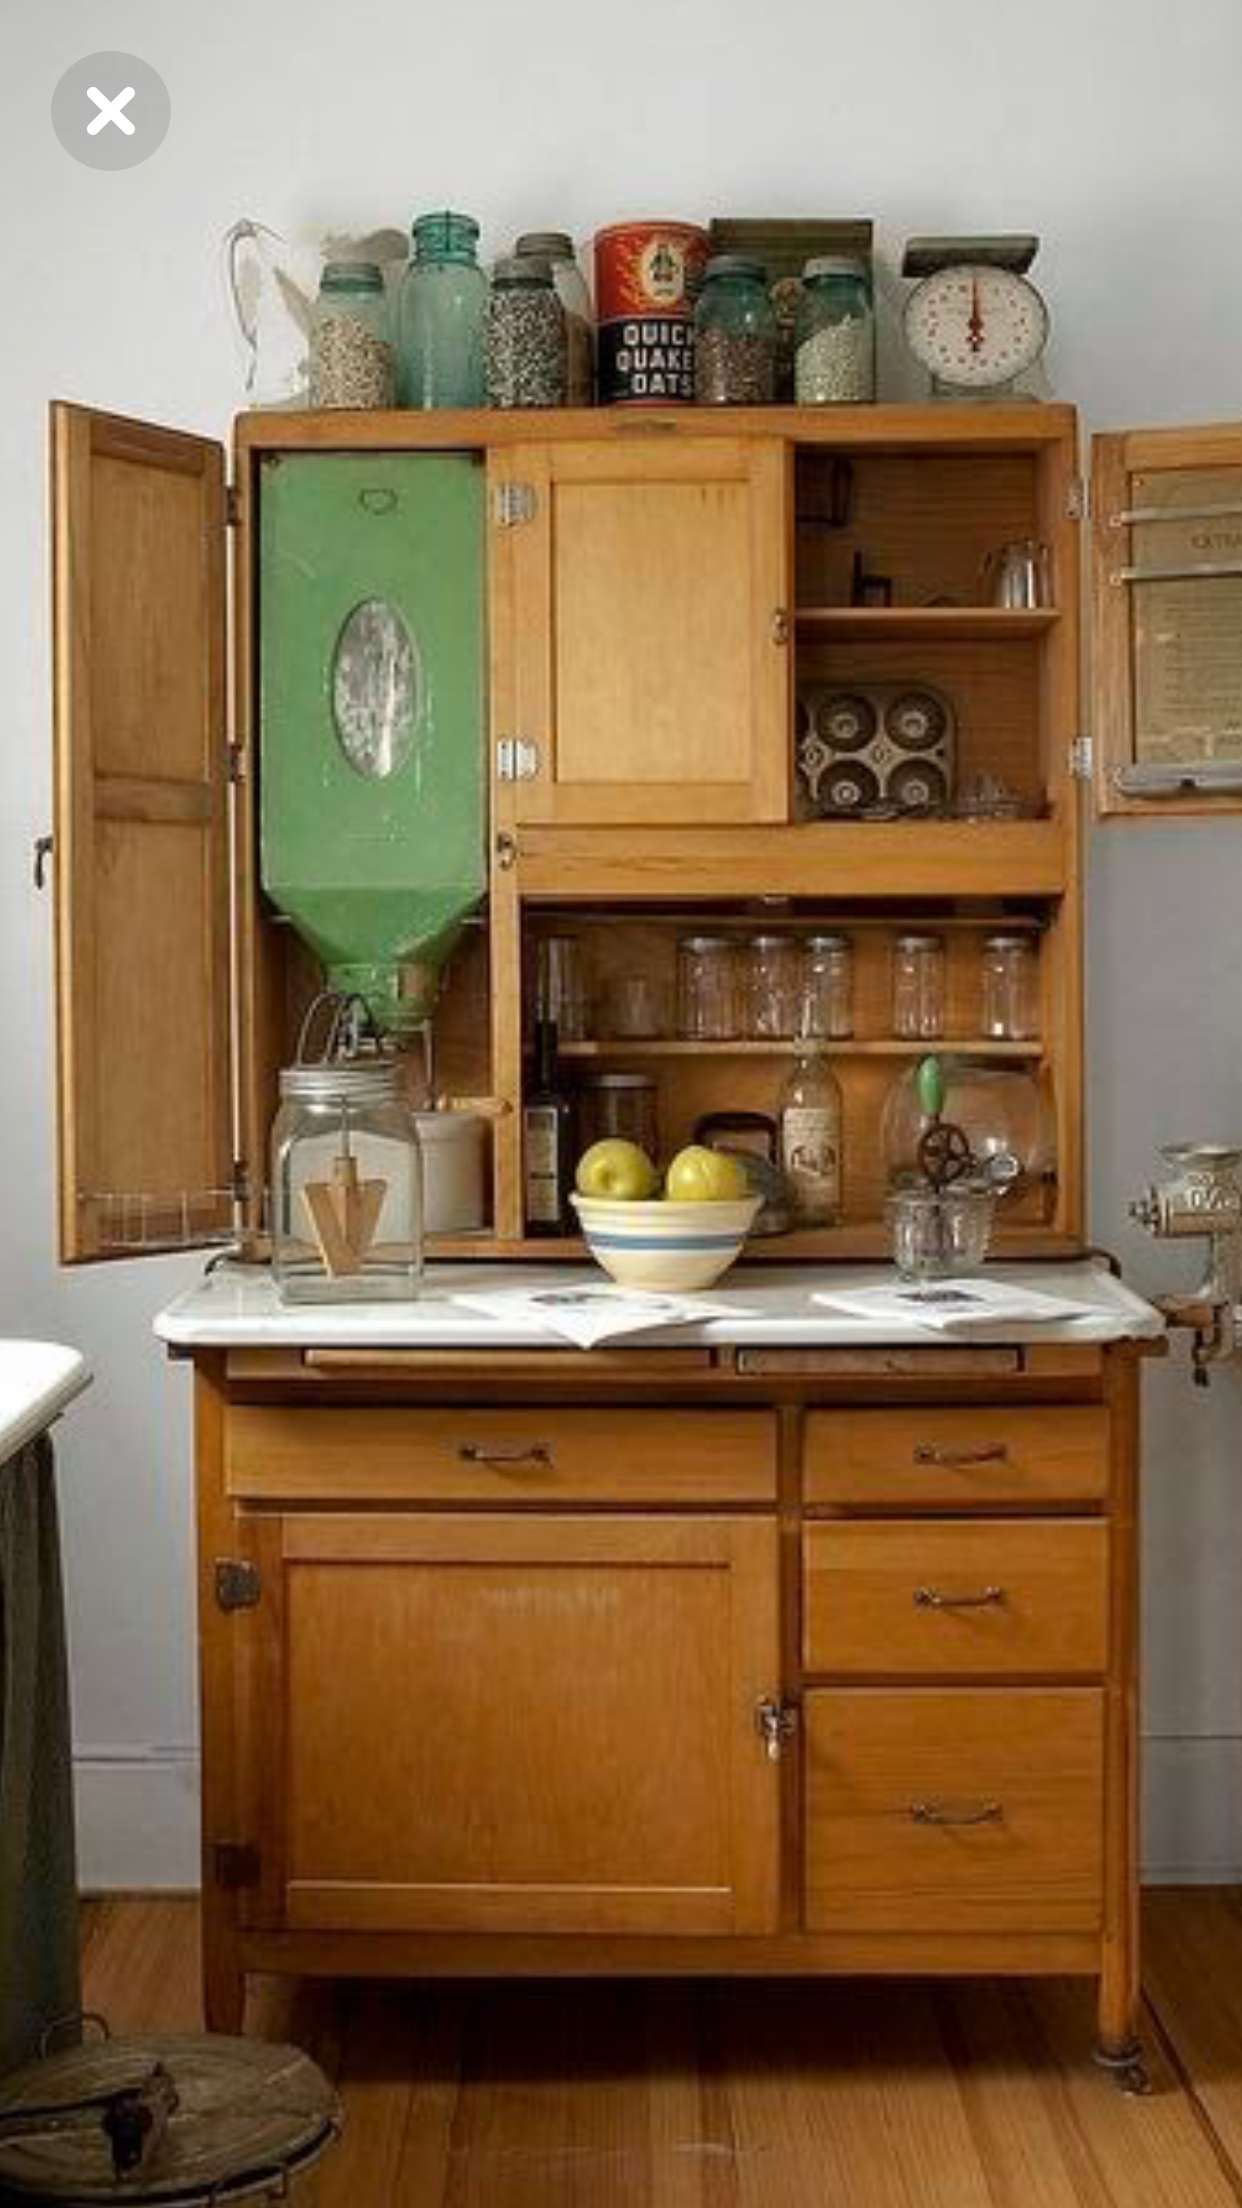 Pin By Rachel Ramthun On Farmhouse Green Kitchen With Cobalt Bluefarmhouse Old Kitchen Kitchen Decor Kitchen Cupboards